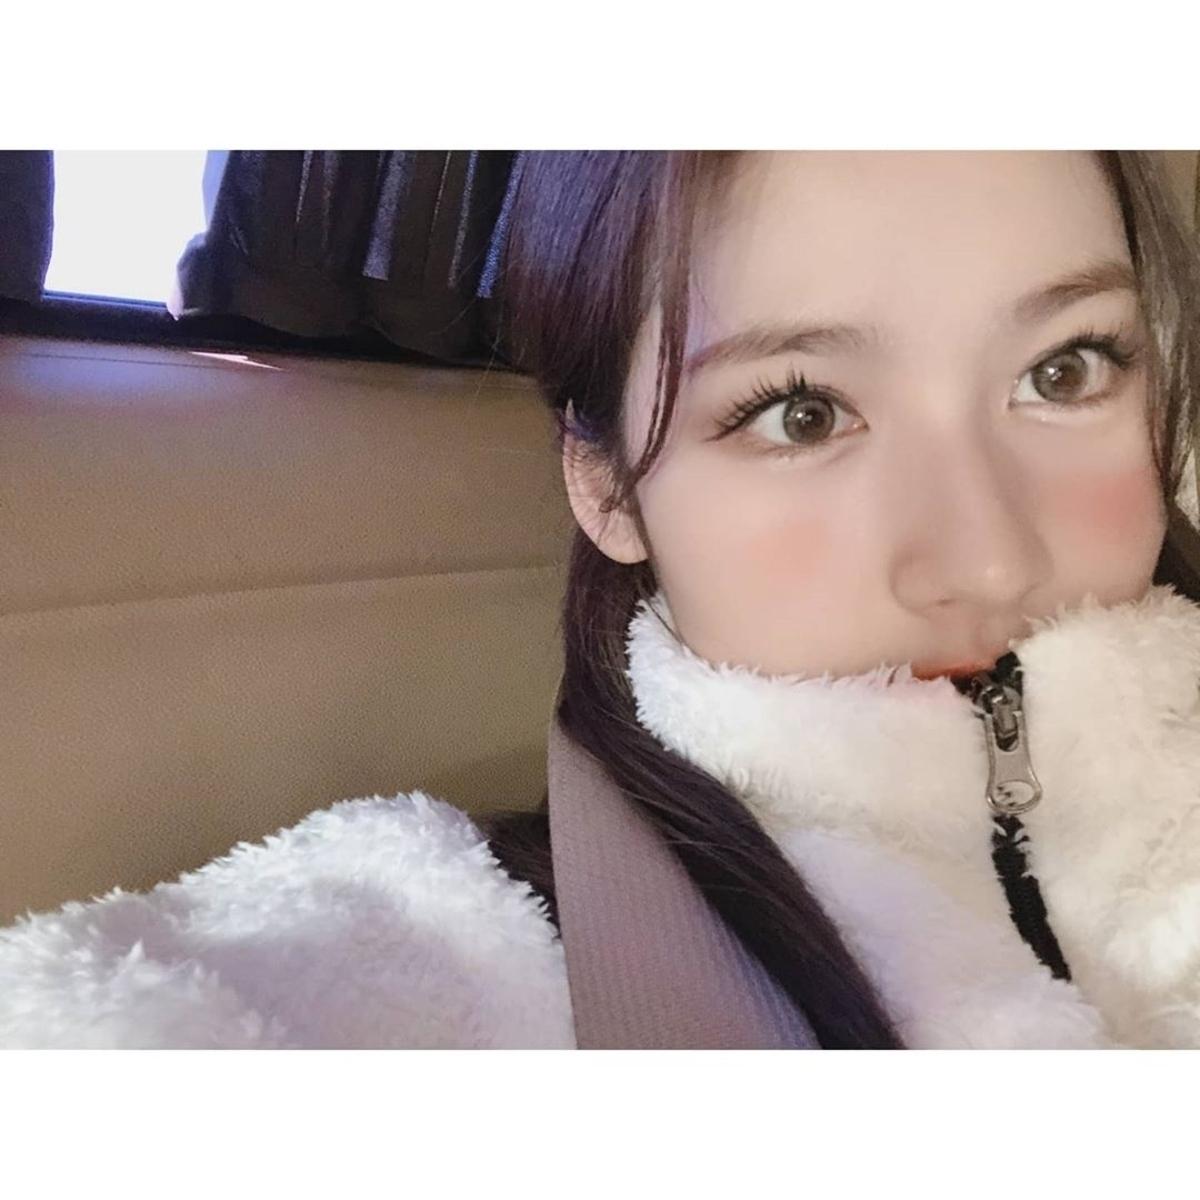 TWICE Sana凑崎纱夏公开与粉丝约定的超近距离自拍